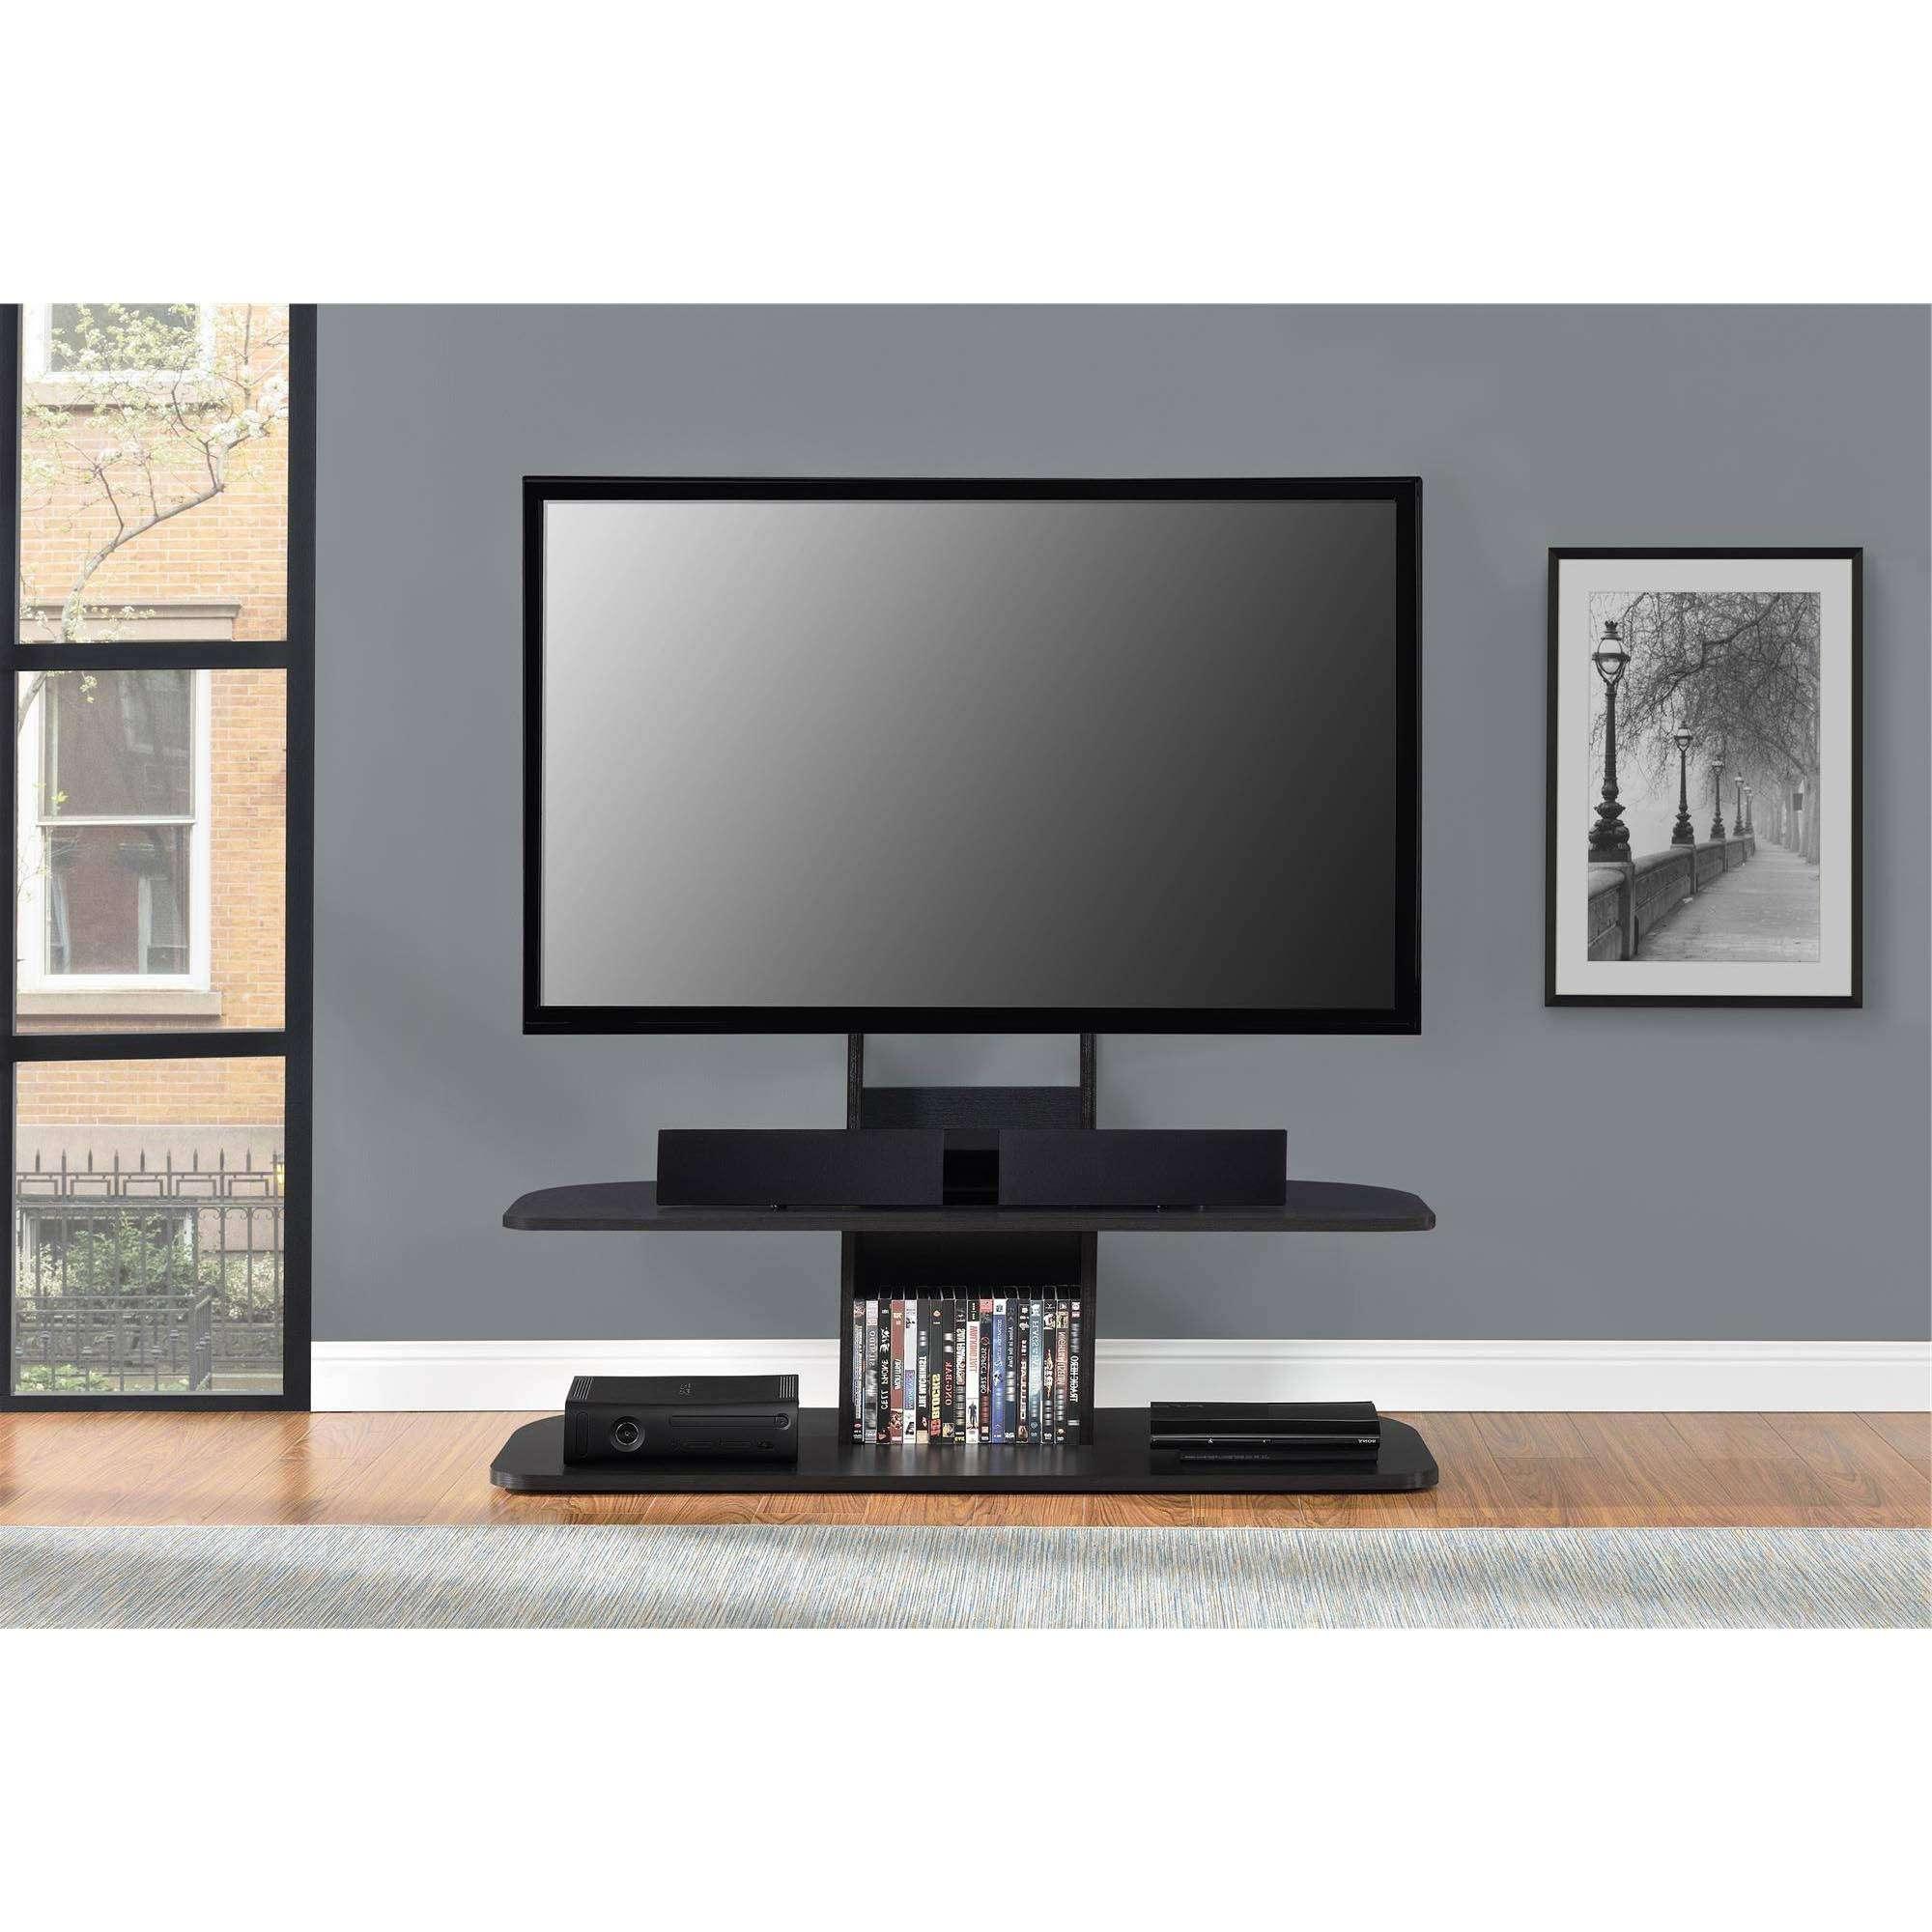 Tv Stands & Entertainment Centers – Walmart Intended For Entertainment Center Tv Stands (View 6 of 15)